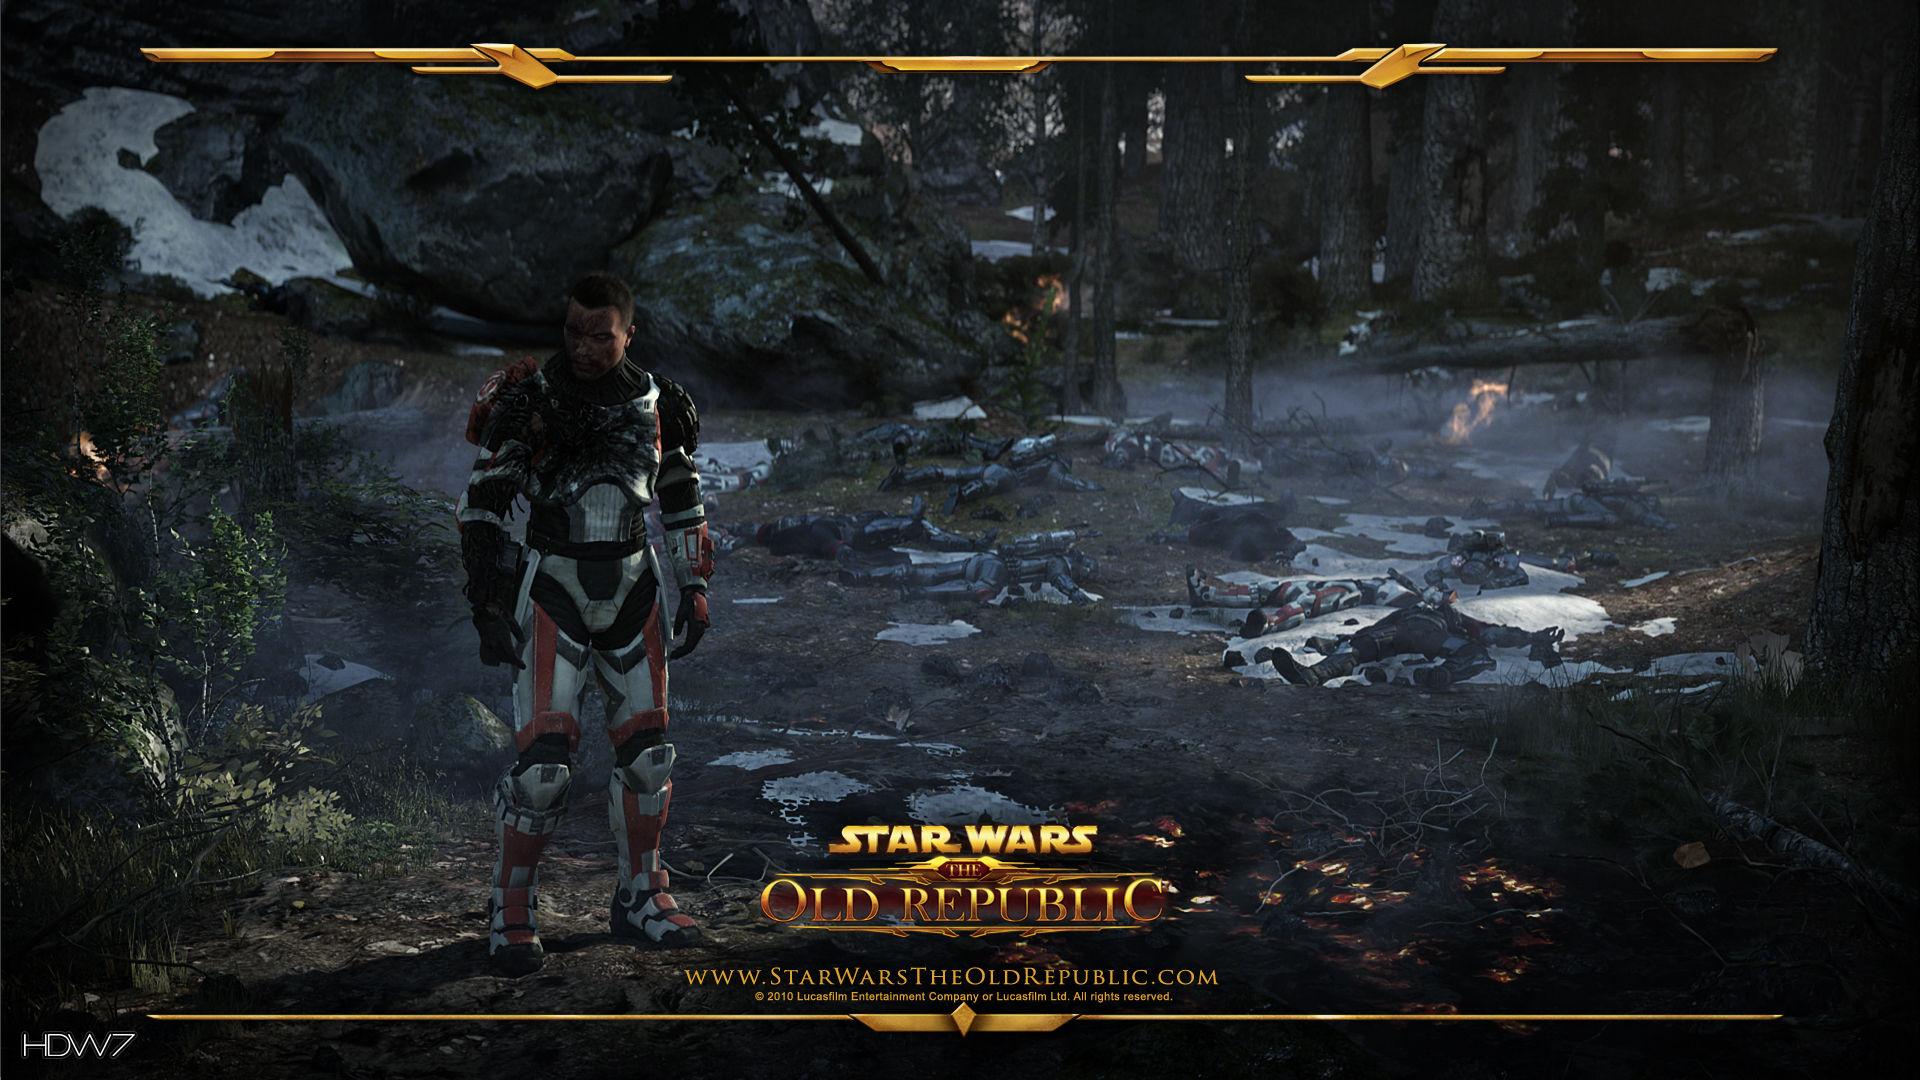 star wars the old republic last trooper standing 1920x1080